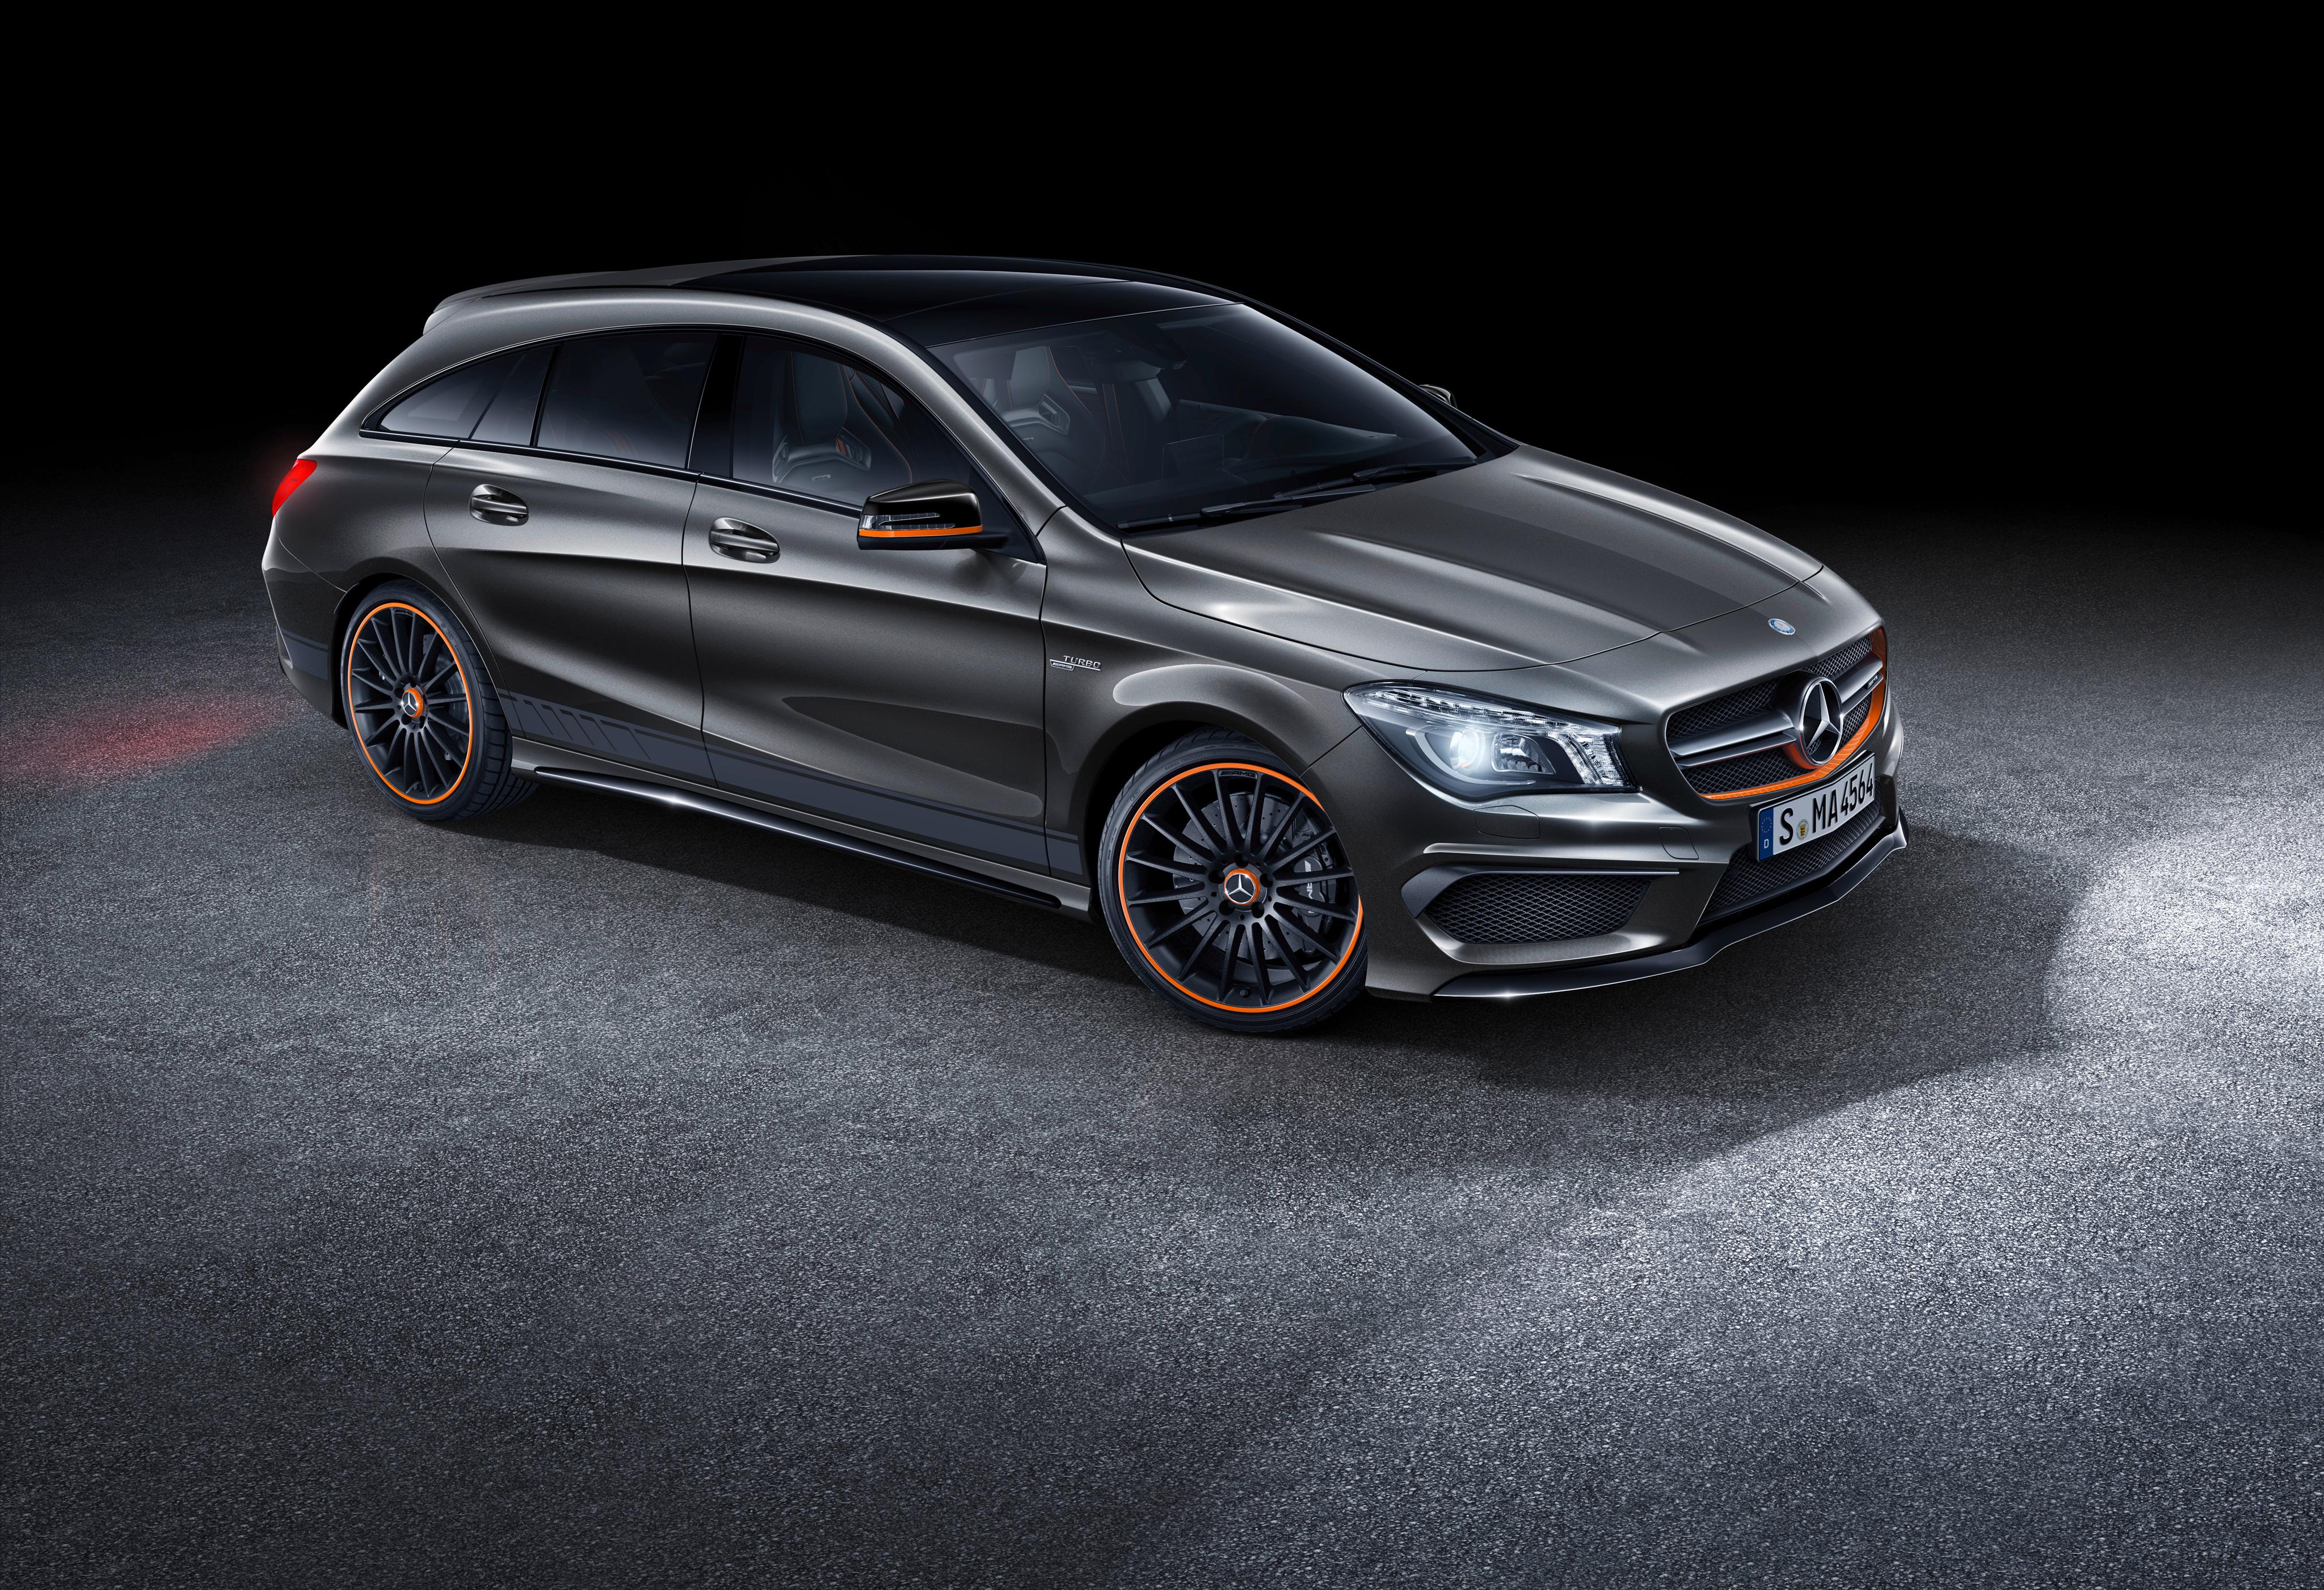 Fondos De Pantalla Mercedes Amg Cla 45 2015 X117